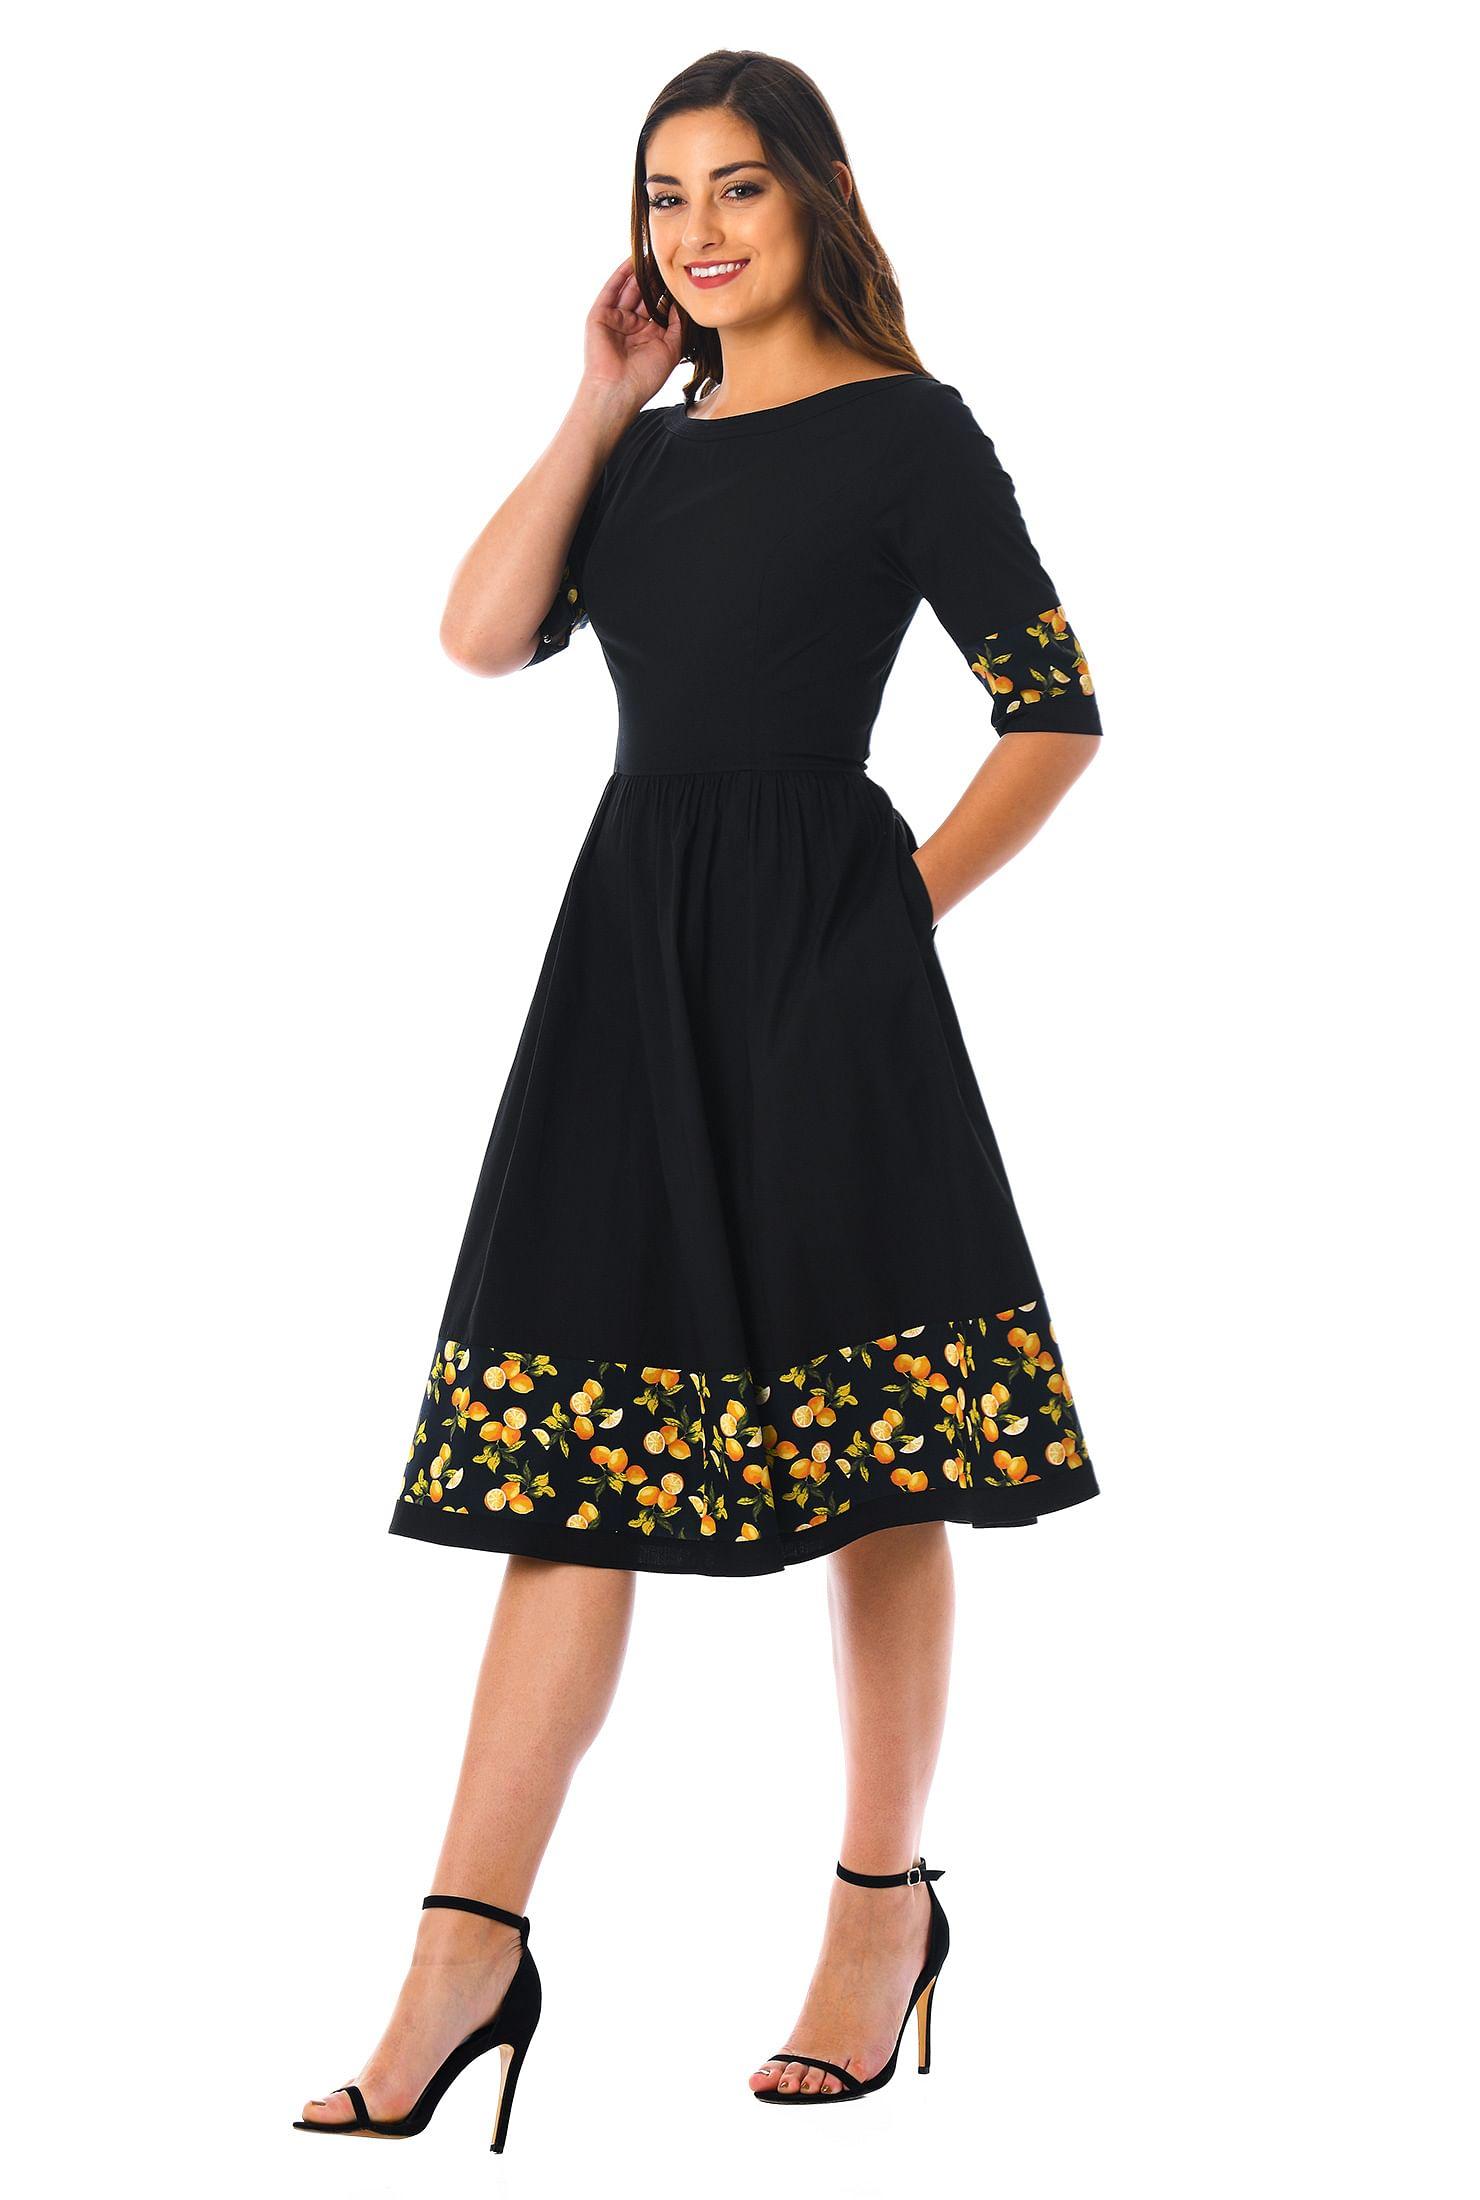 2e2bed138df back zip dresses, below knee length dresses, black/navy/yellow dresses